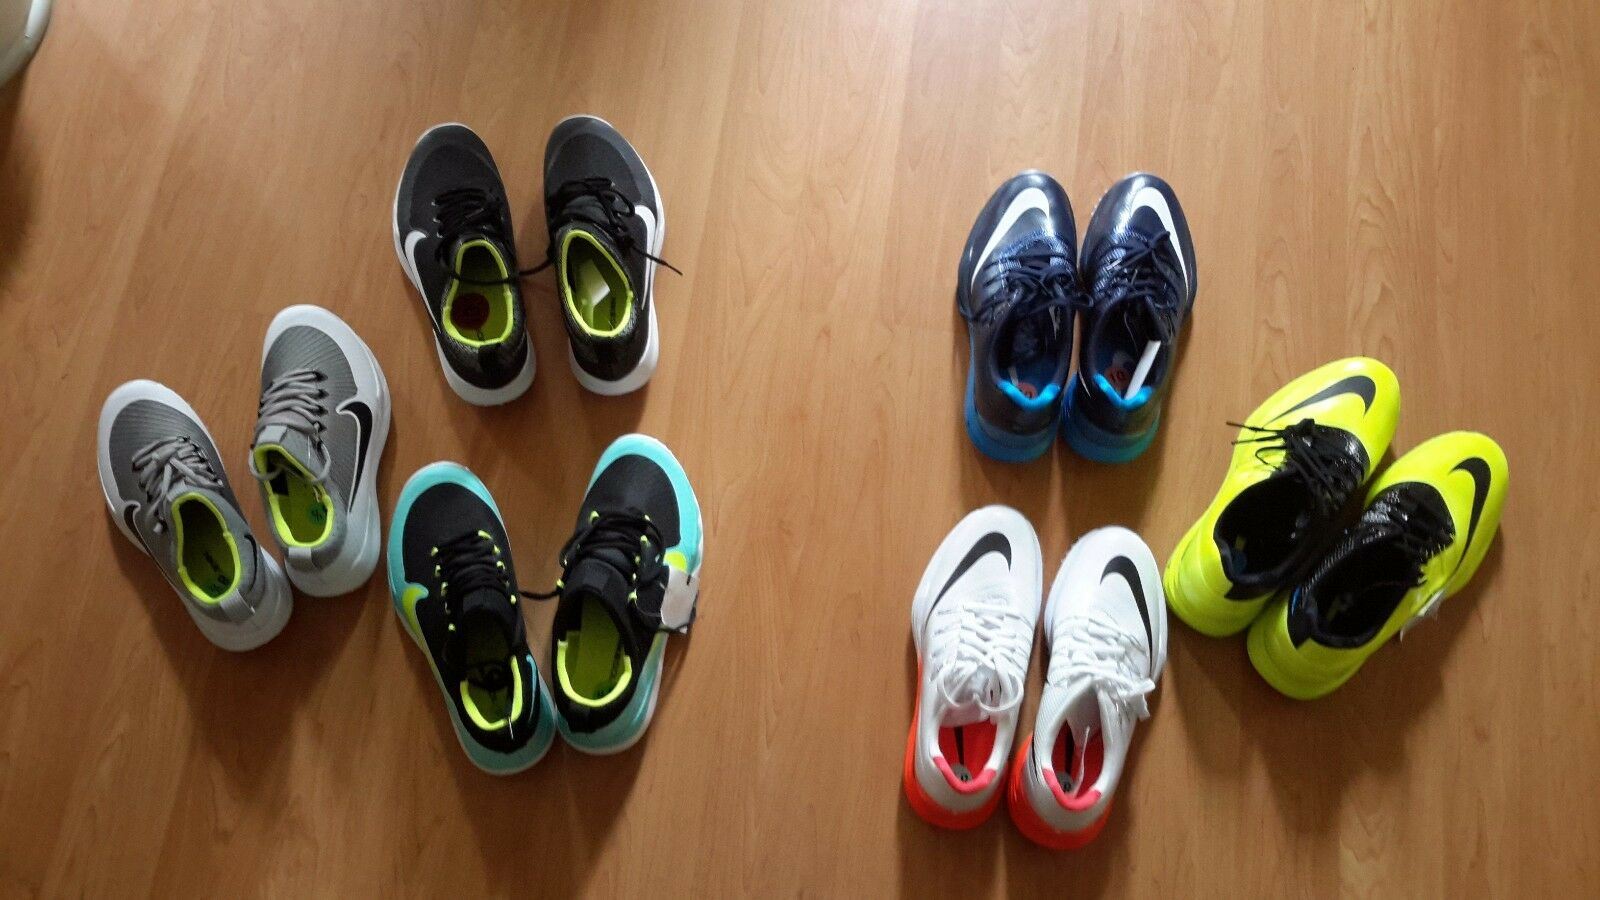 Nike hombre' fi Lunar Control 4 o fi hombre' Premiere zapatos de golf, MSRP 128-150 9ba8f2